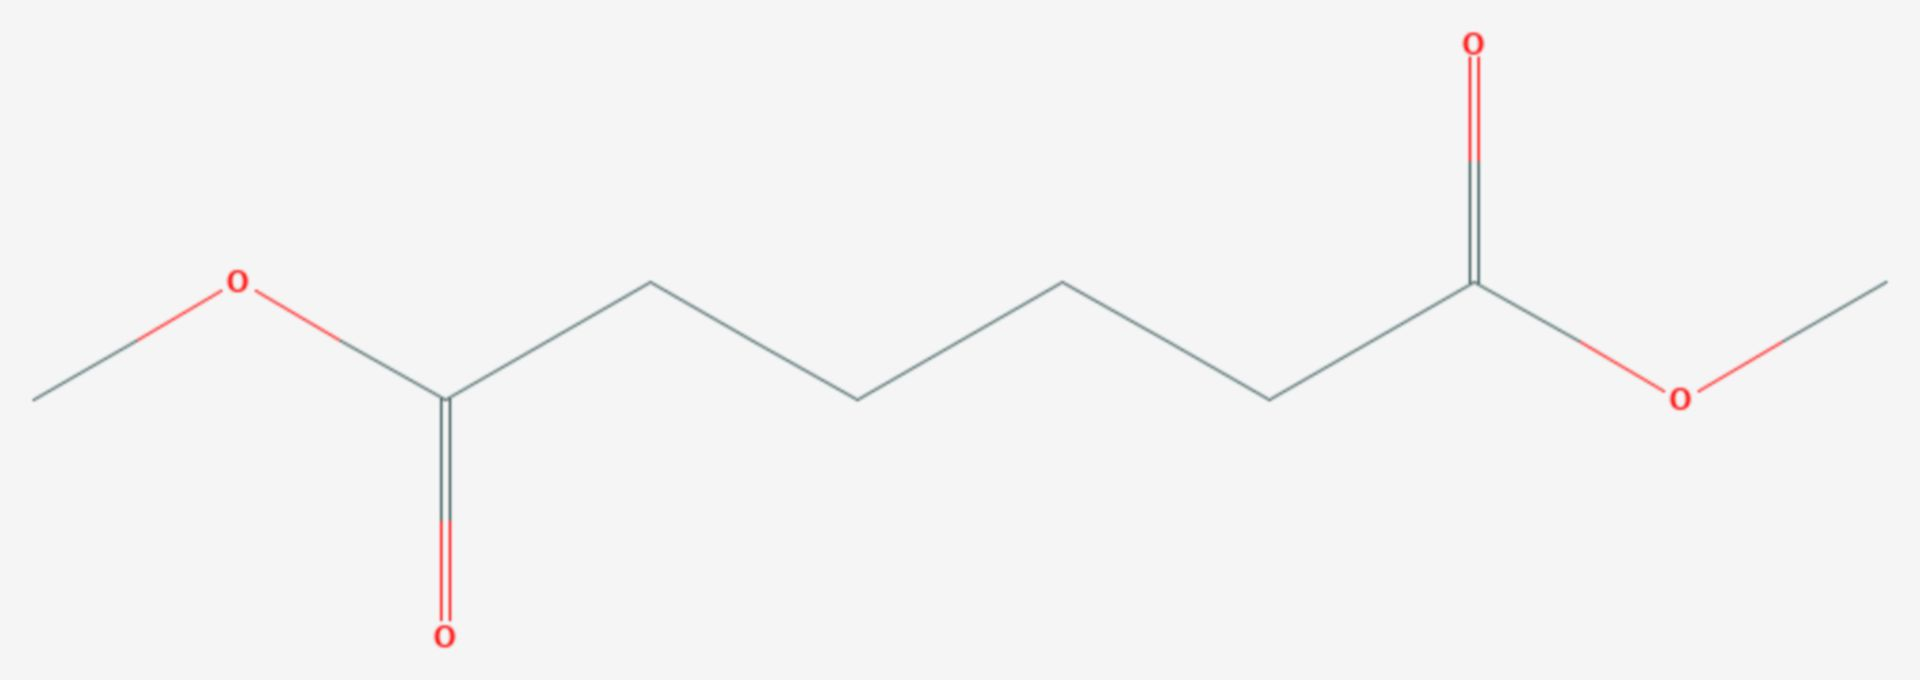 Dimethyladipat (Strukturformel)